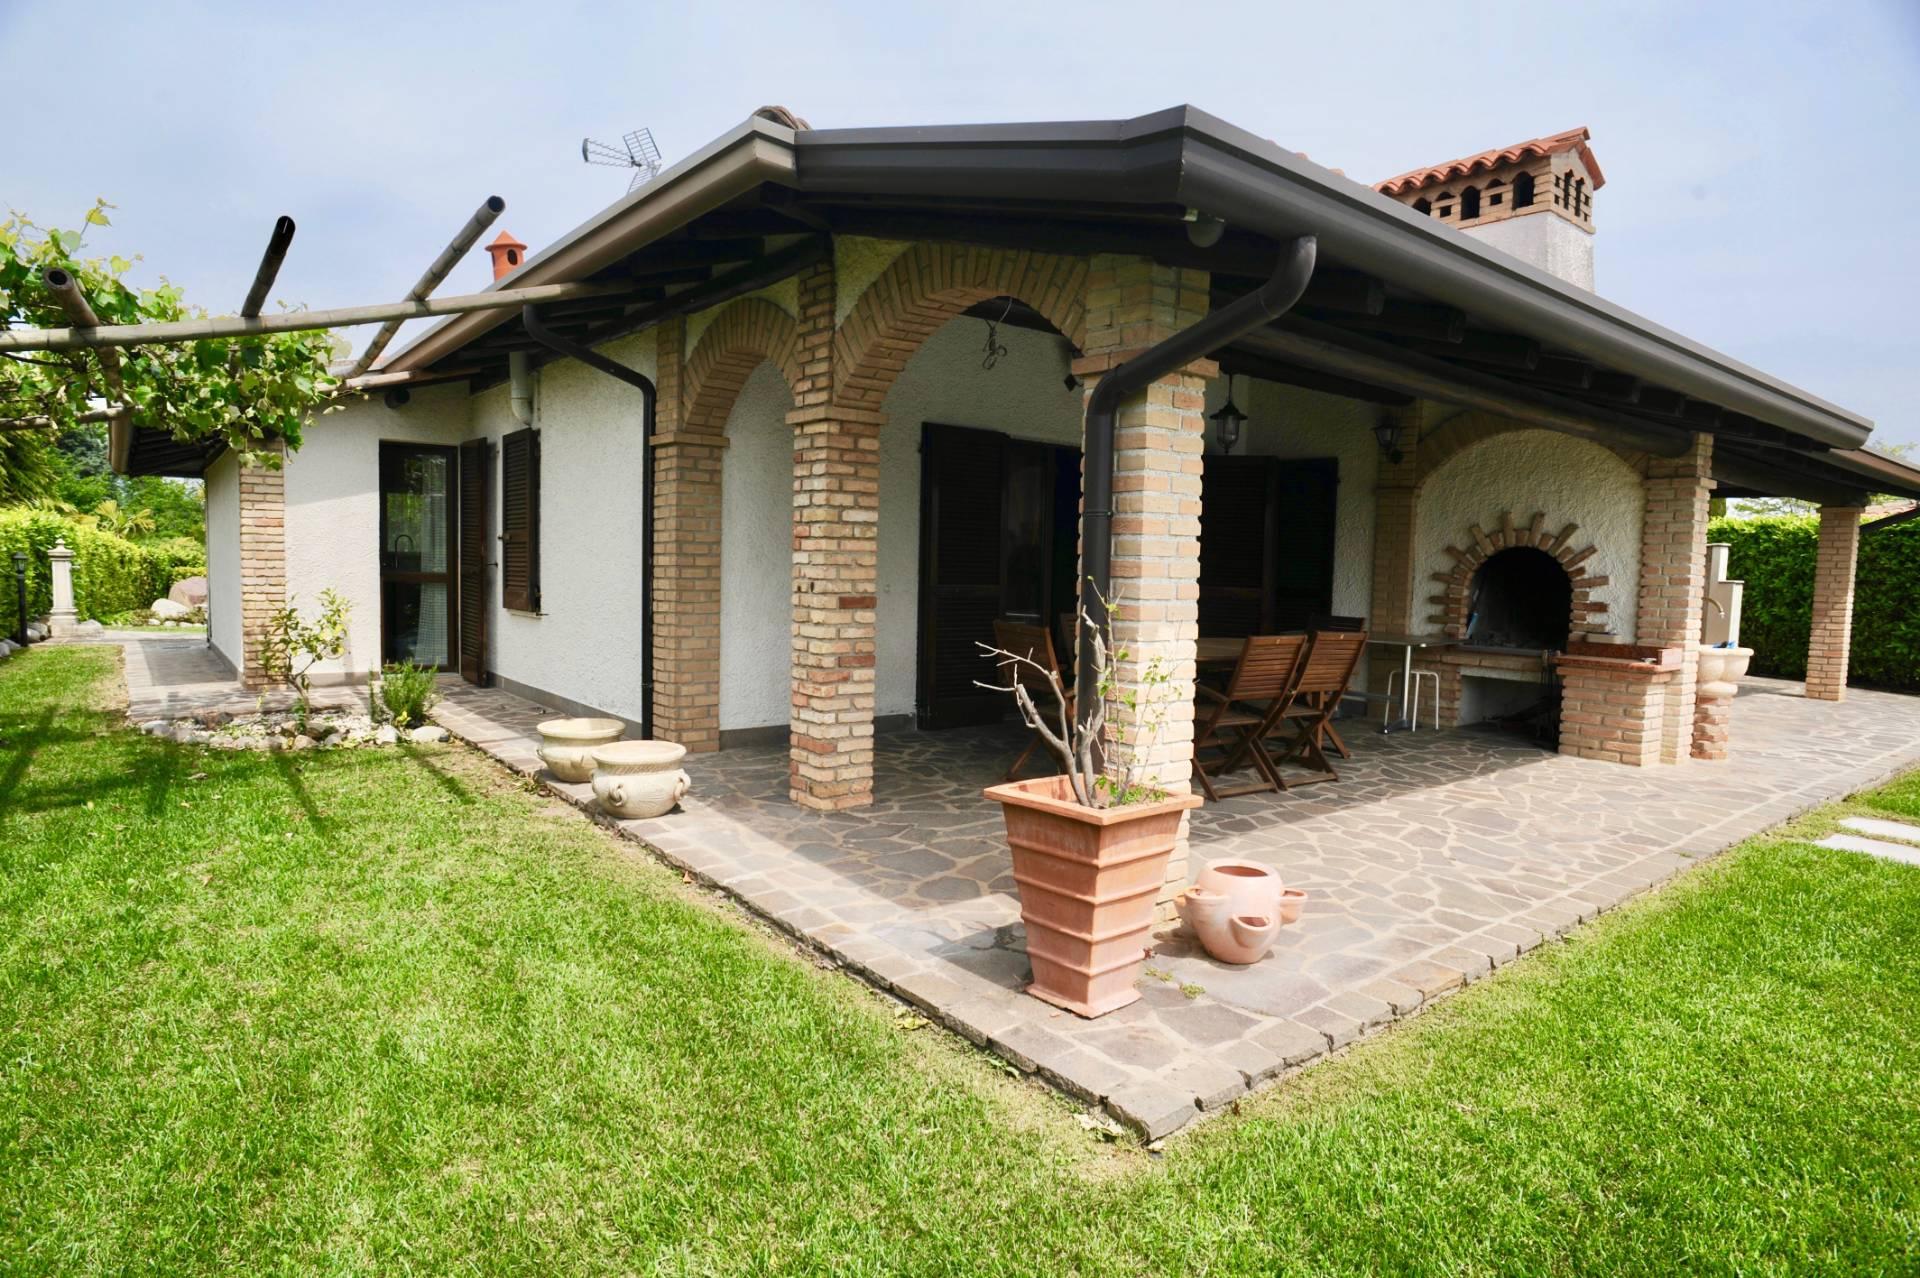 Villa in Vendita a Padenghe Sul Garda: 3 locali, 100 mq - Foto 21